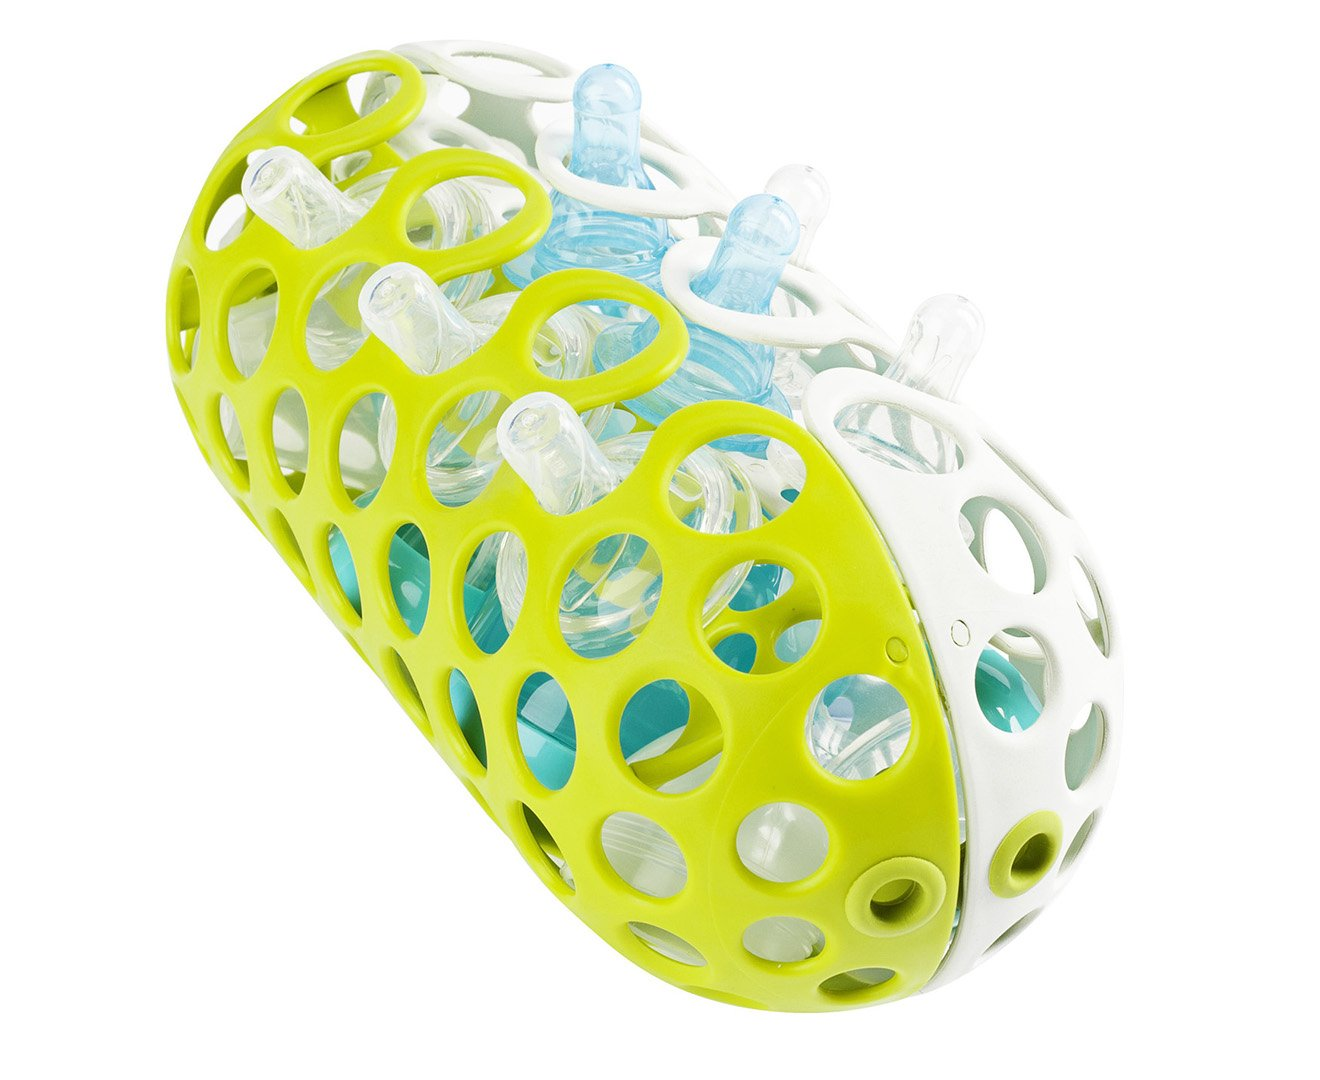 Boon Clutch Dishwasher Basket - Green